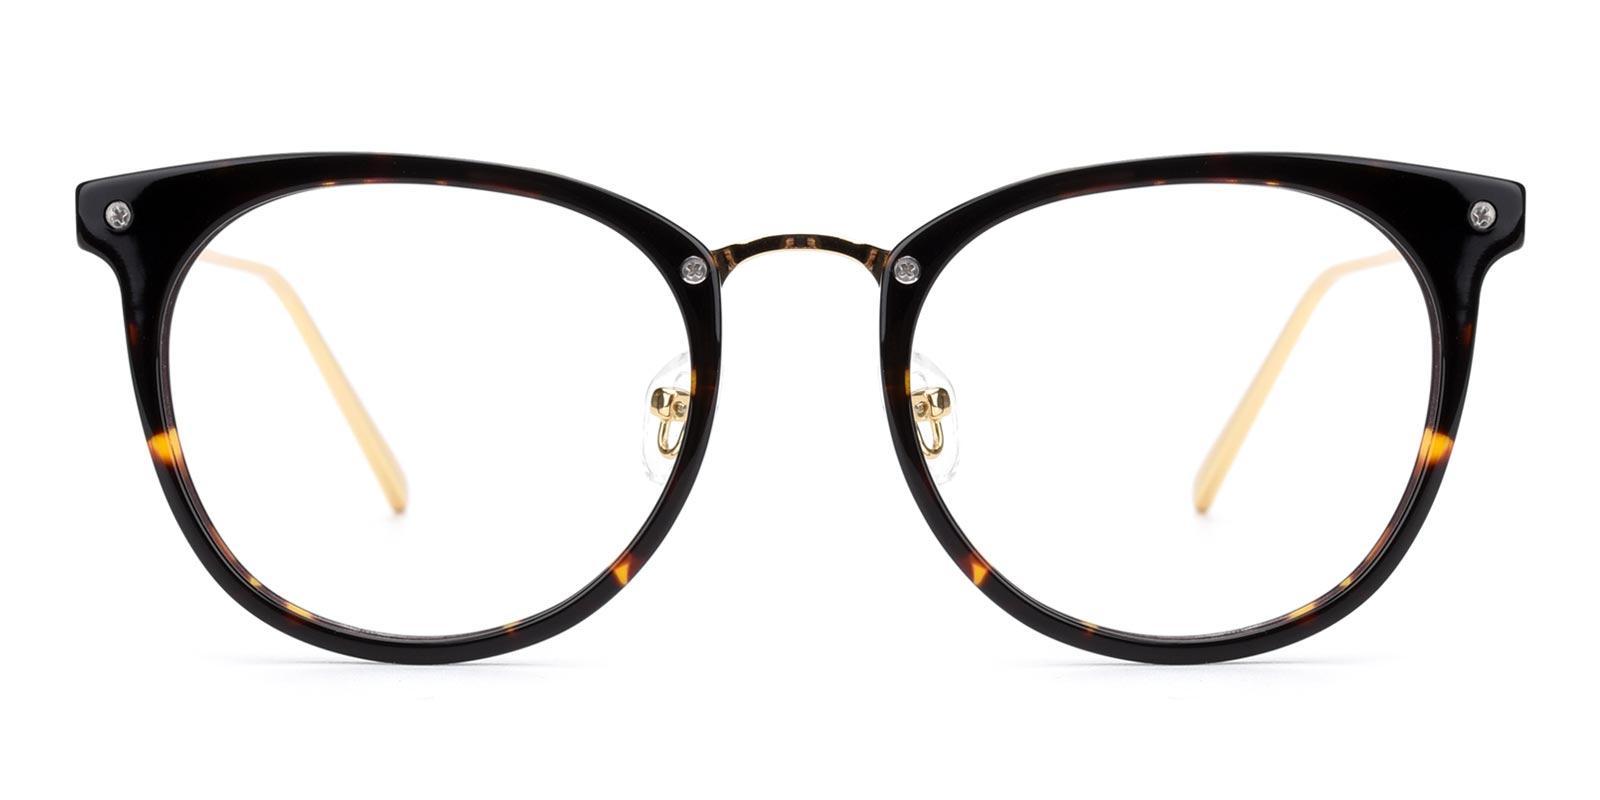 Nina-Tortoise-Round-TR-Eyeglasses-detail